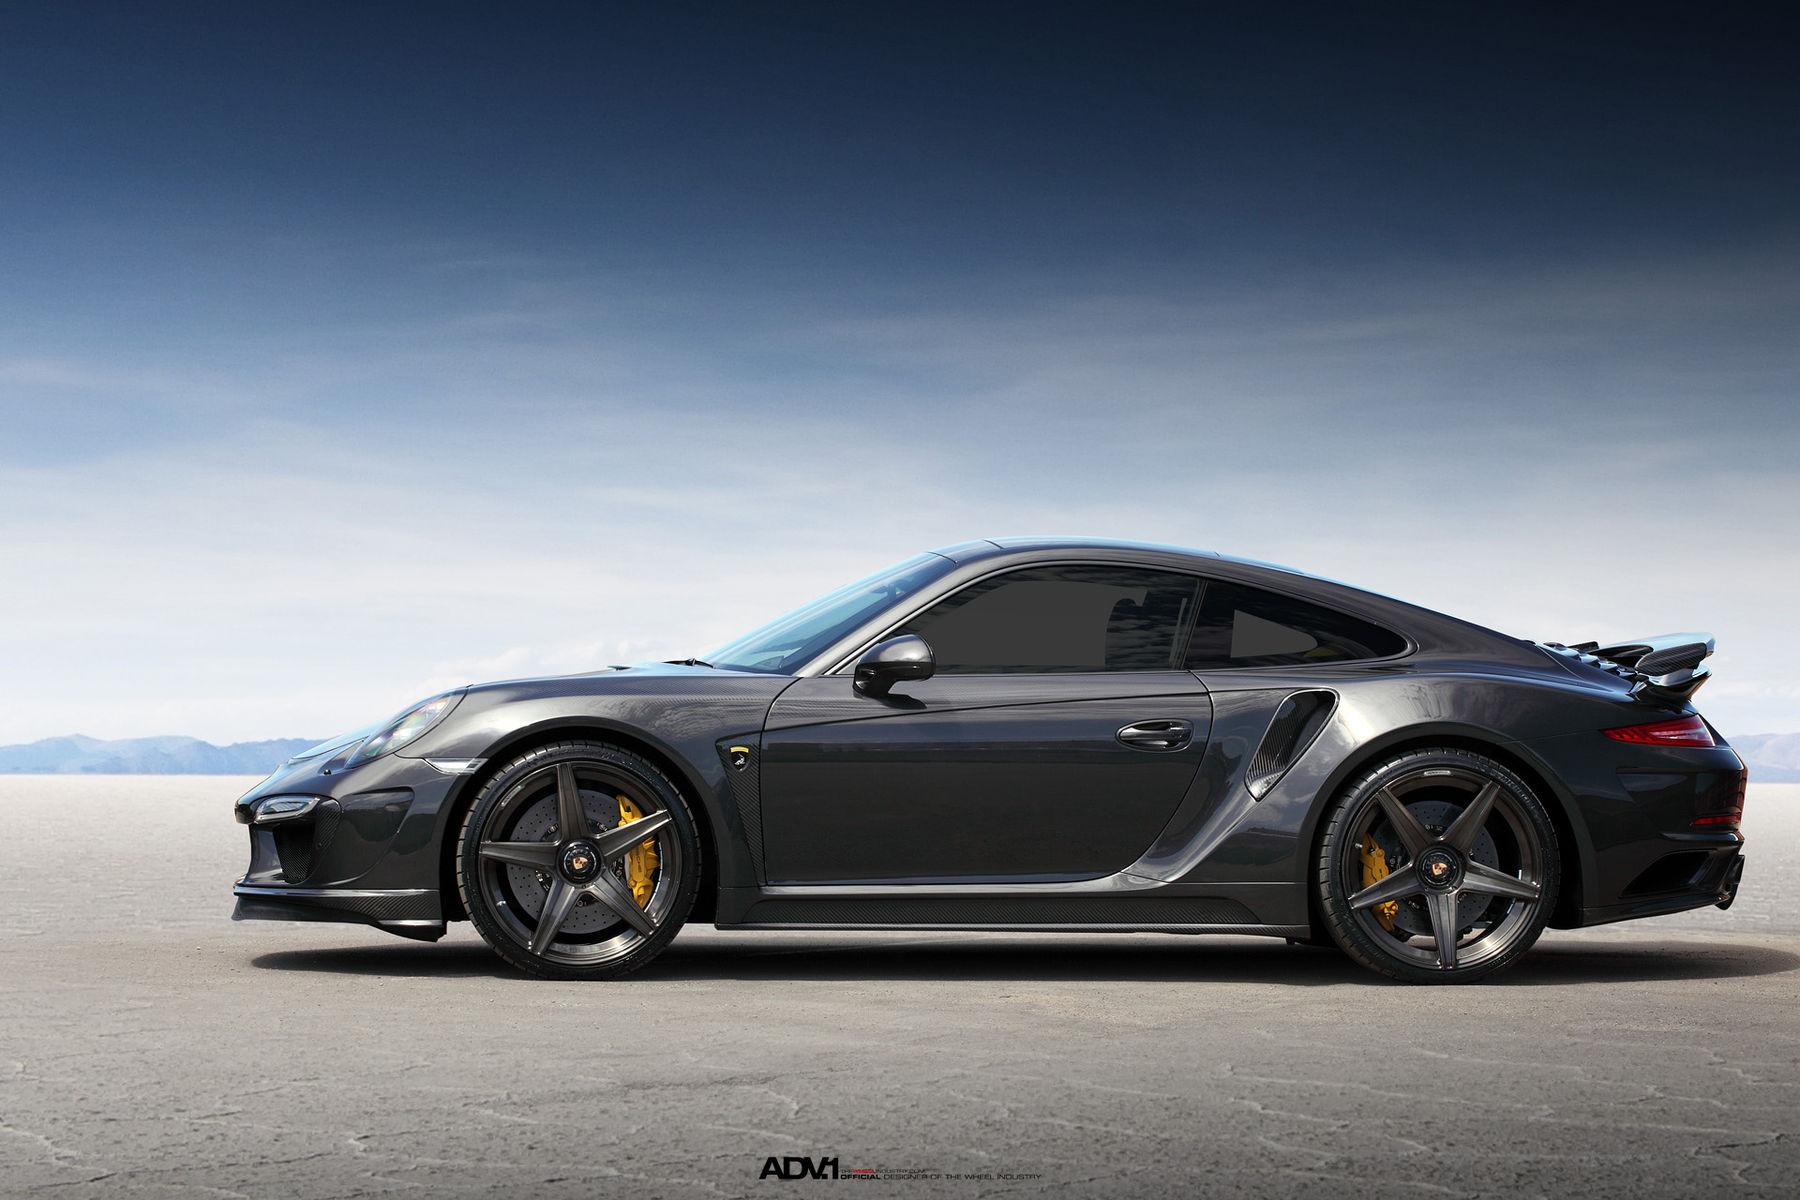 2015 Porsche 911 | Top Car Stinger 991 Turbo S